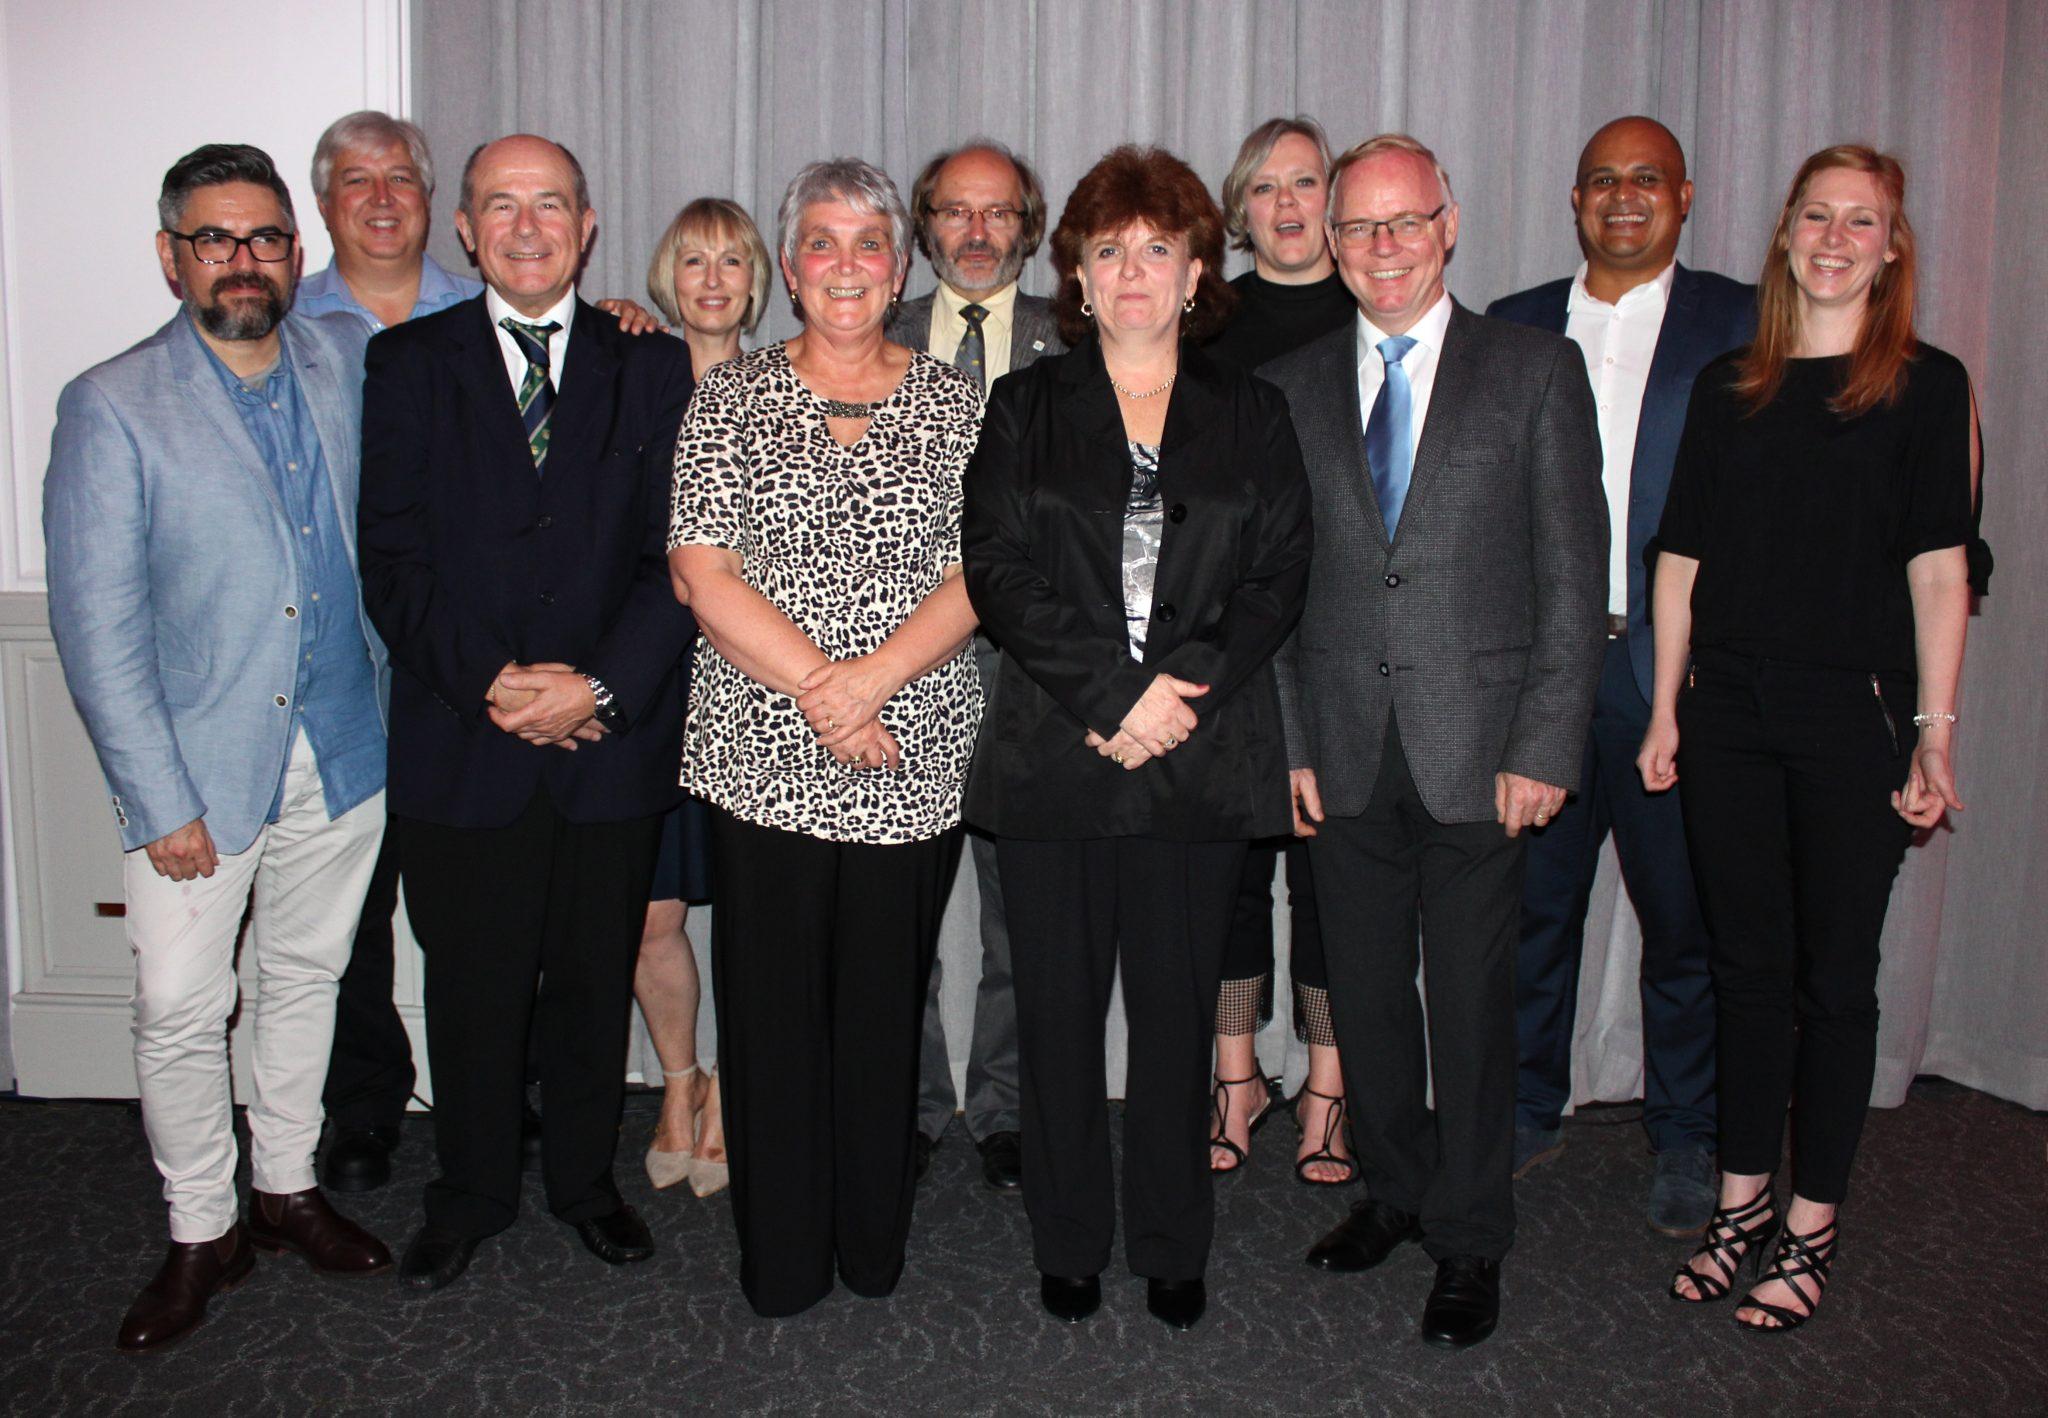 From l.t.r.: Dr Sigfredo Fuentes (Australia), prof Francois Halleen (SASEV Board member), prof Vittorino Novello (Italy), Melané Vivier (Univ. Stellenbosch), Roleen Carstens (President – SASEV), prof Manfred Grossman (Germany), Anel Andrag (Winetech), prof Maret du Toit (Univ. Stellebosch), Prof Reinhard Töpfer (Germany), Gerard Martin (Winetech) and Tarryn Wettergreen (SASEV Board member).